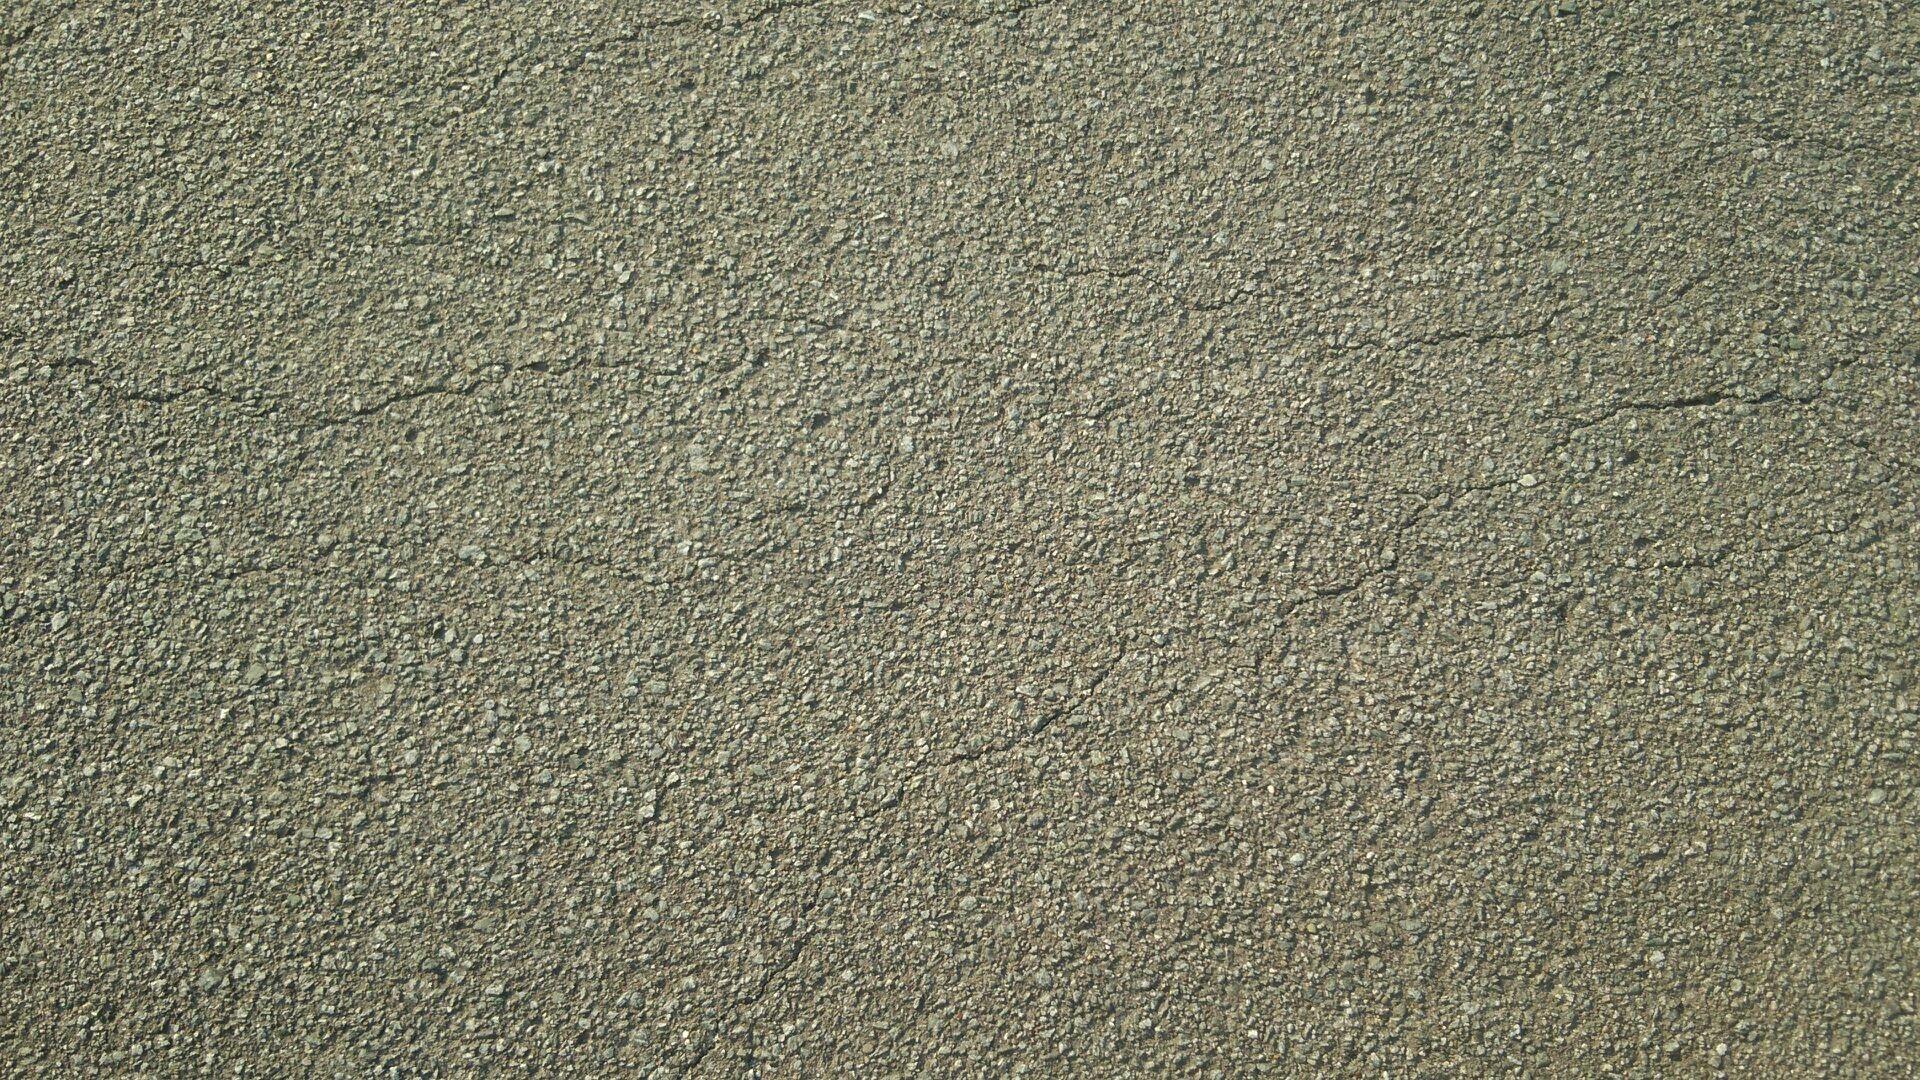 sand road texture floor asphalt green soil material concrete gravel carpet flooring road surface laminate flooring